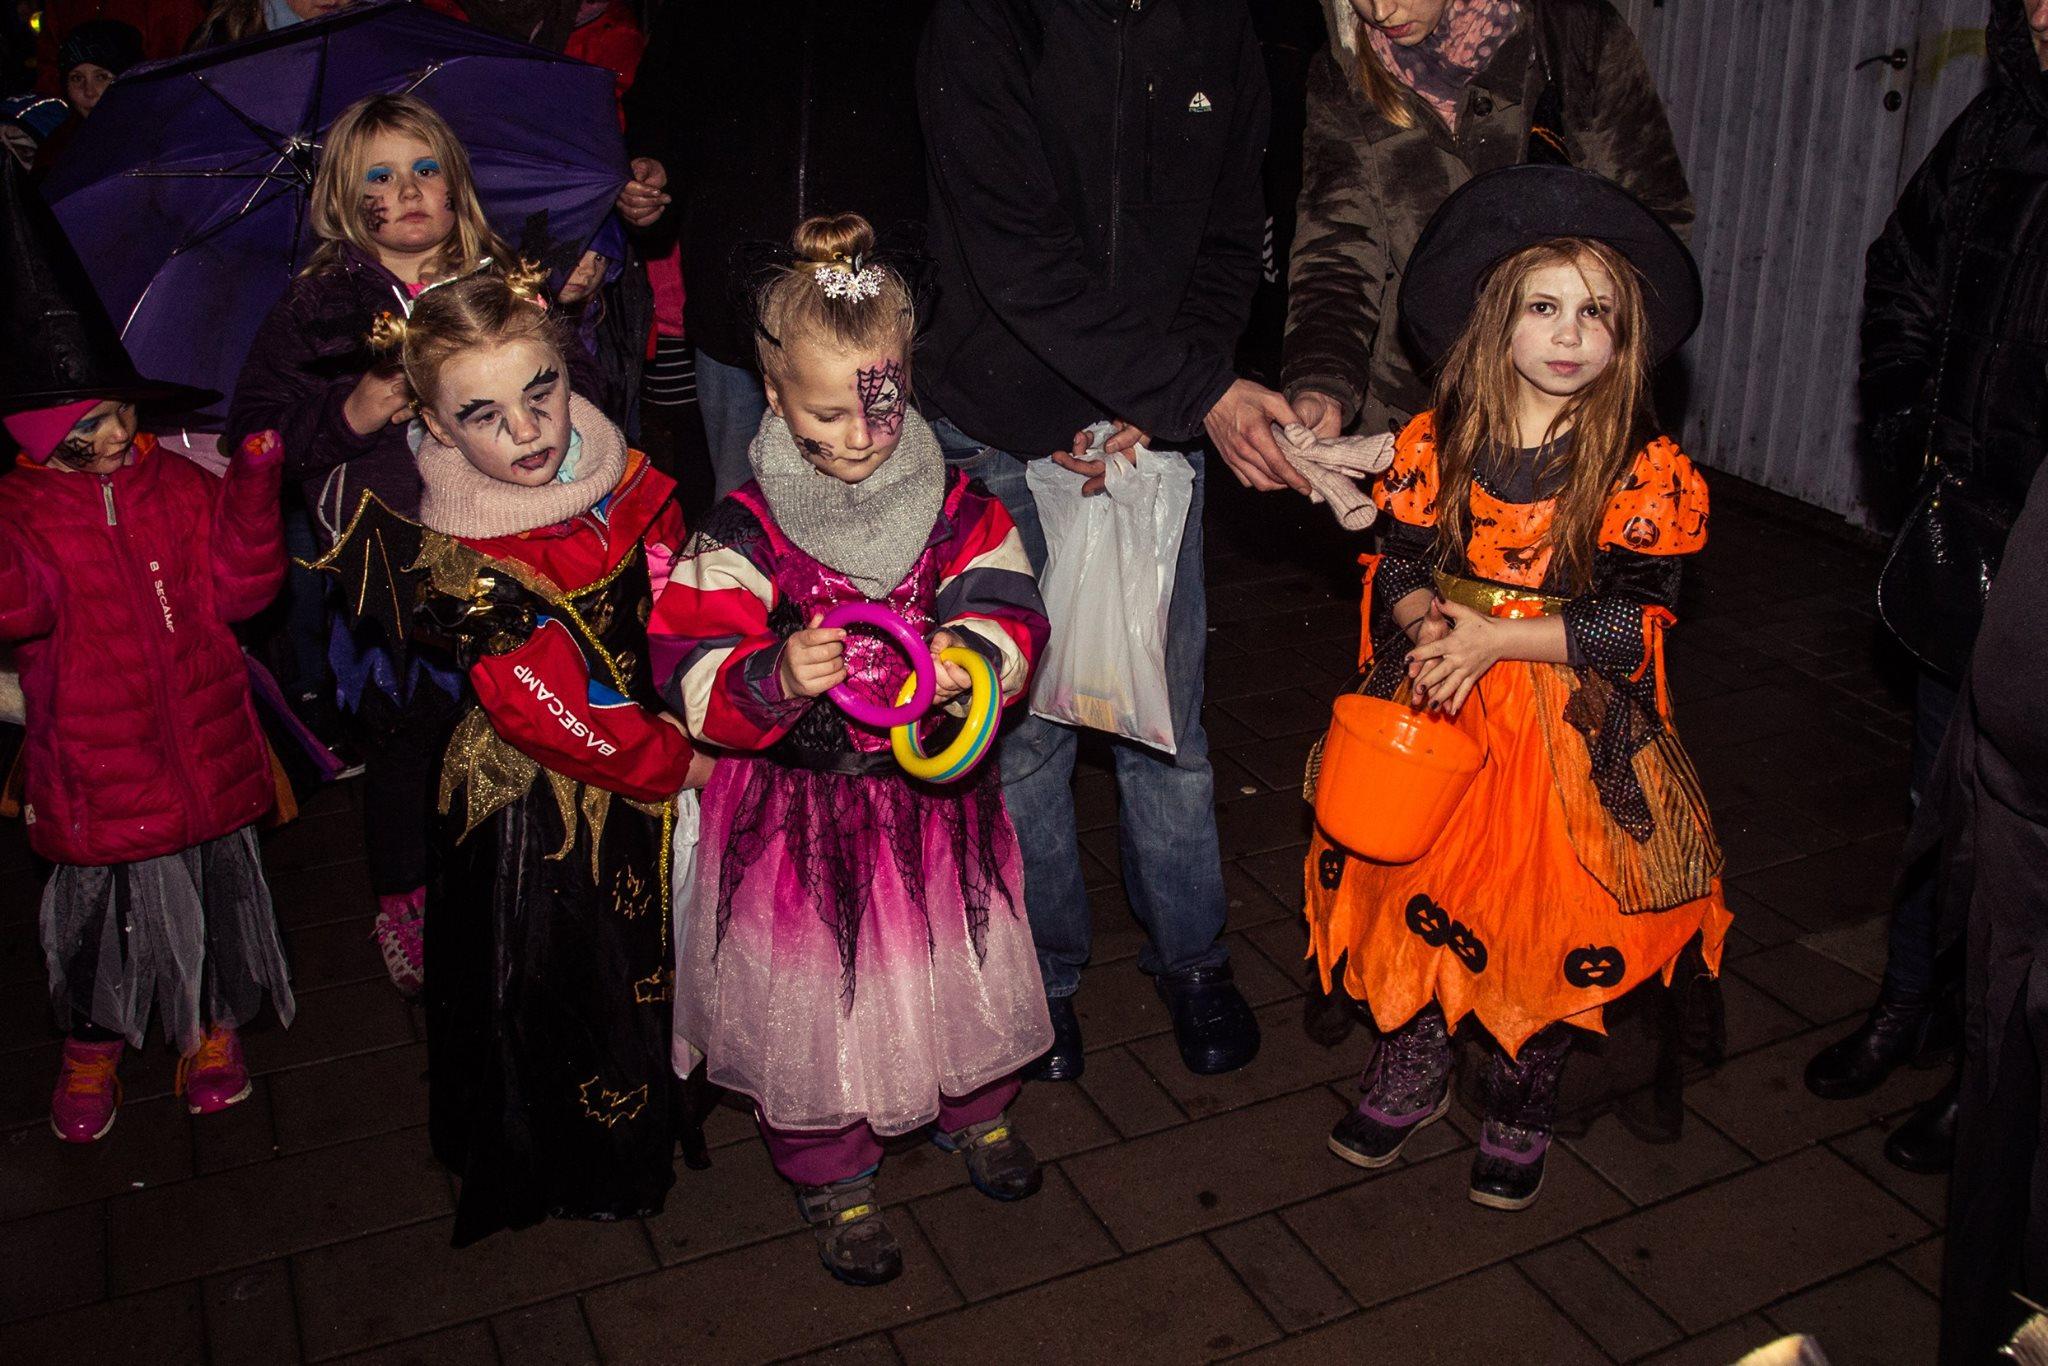 Utkledde barn under HalloVenn-arrangementet i Sarpsborg. Foto.